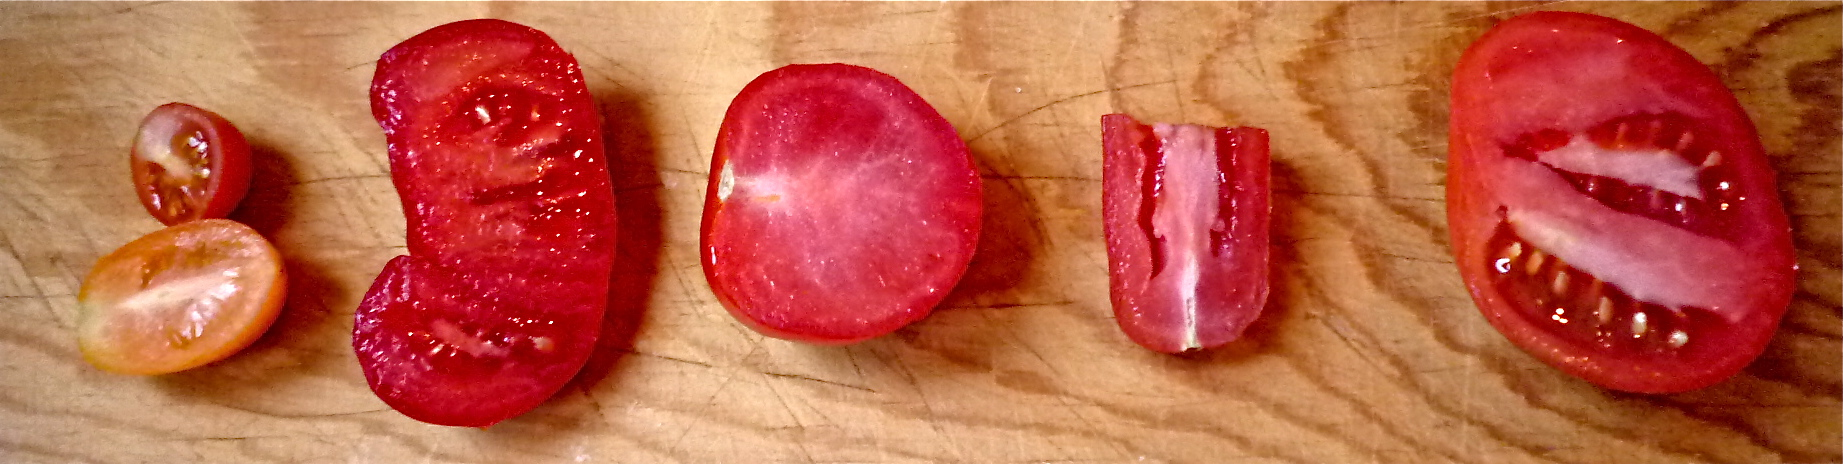 From left: coloured heirloom tomatoes, cluster tomato, Campari cocktail tomato, plum tomato, field tomato